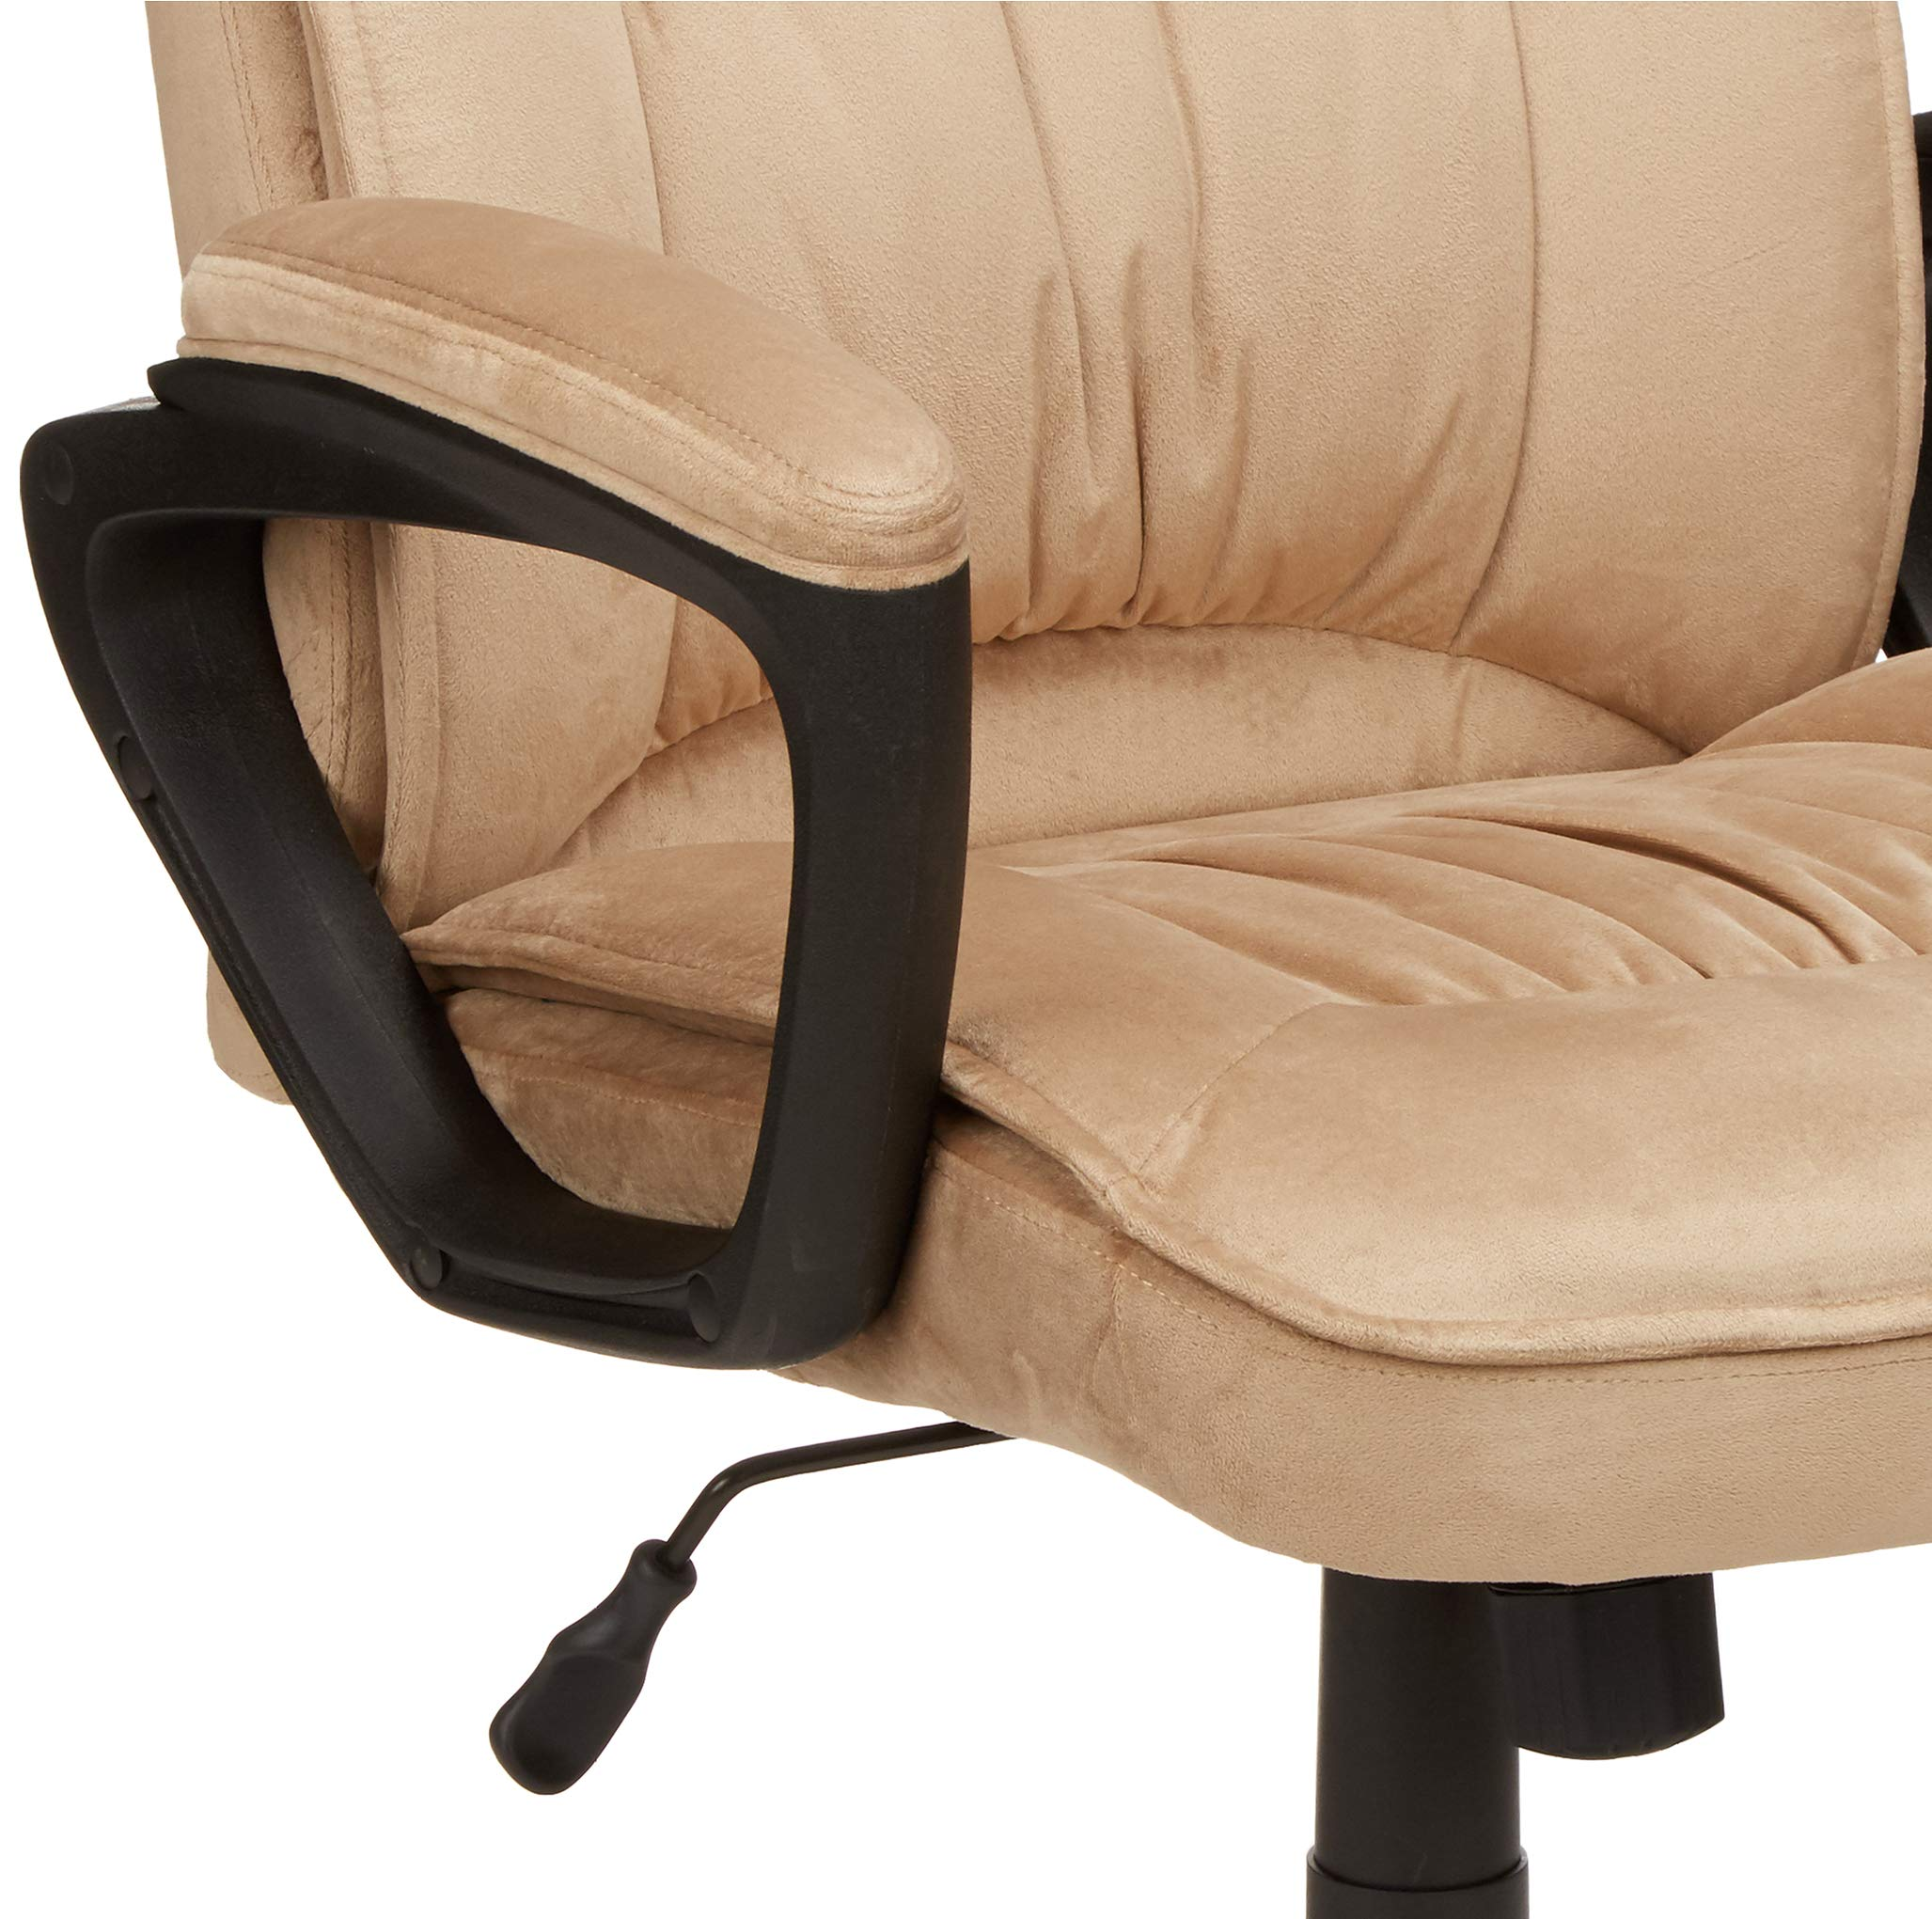 AmazonBasics Classic Office Chair - Adjustable, Swiveling, Microfiber Cover - Light Beige by AmazonBasics (Image #6)